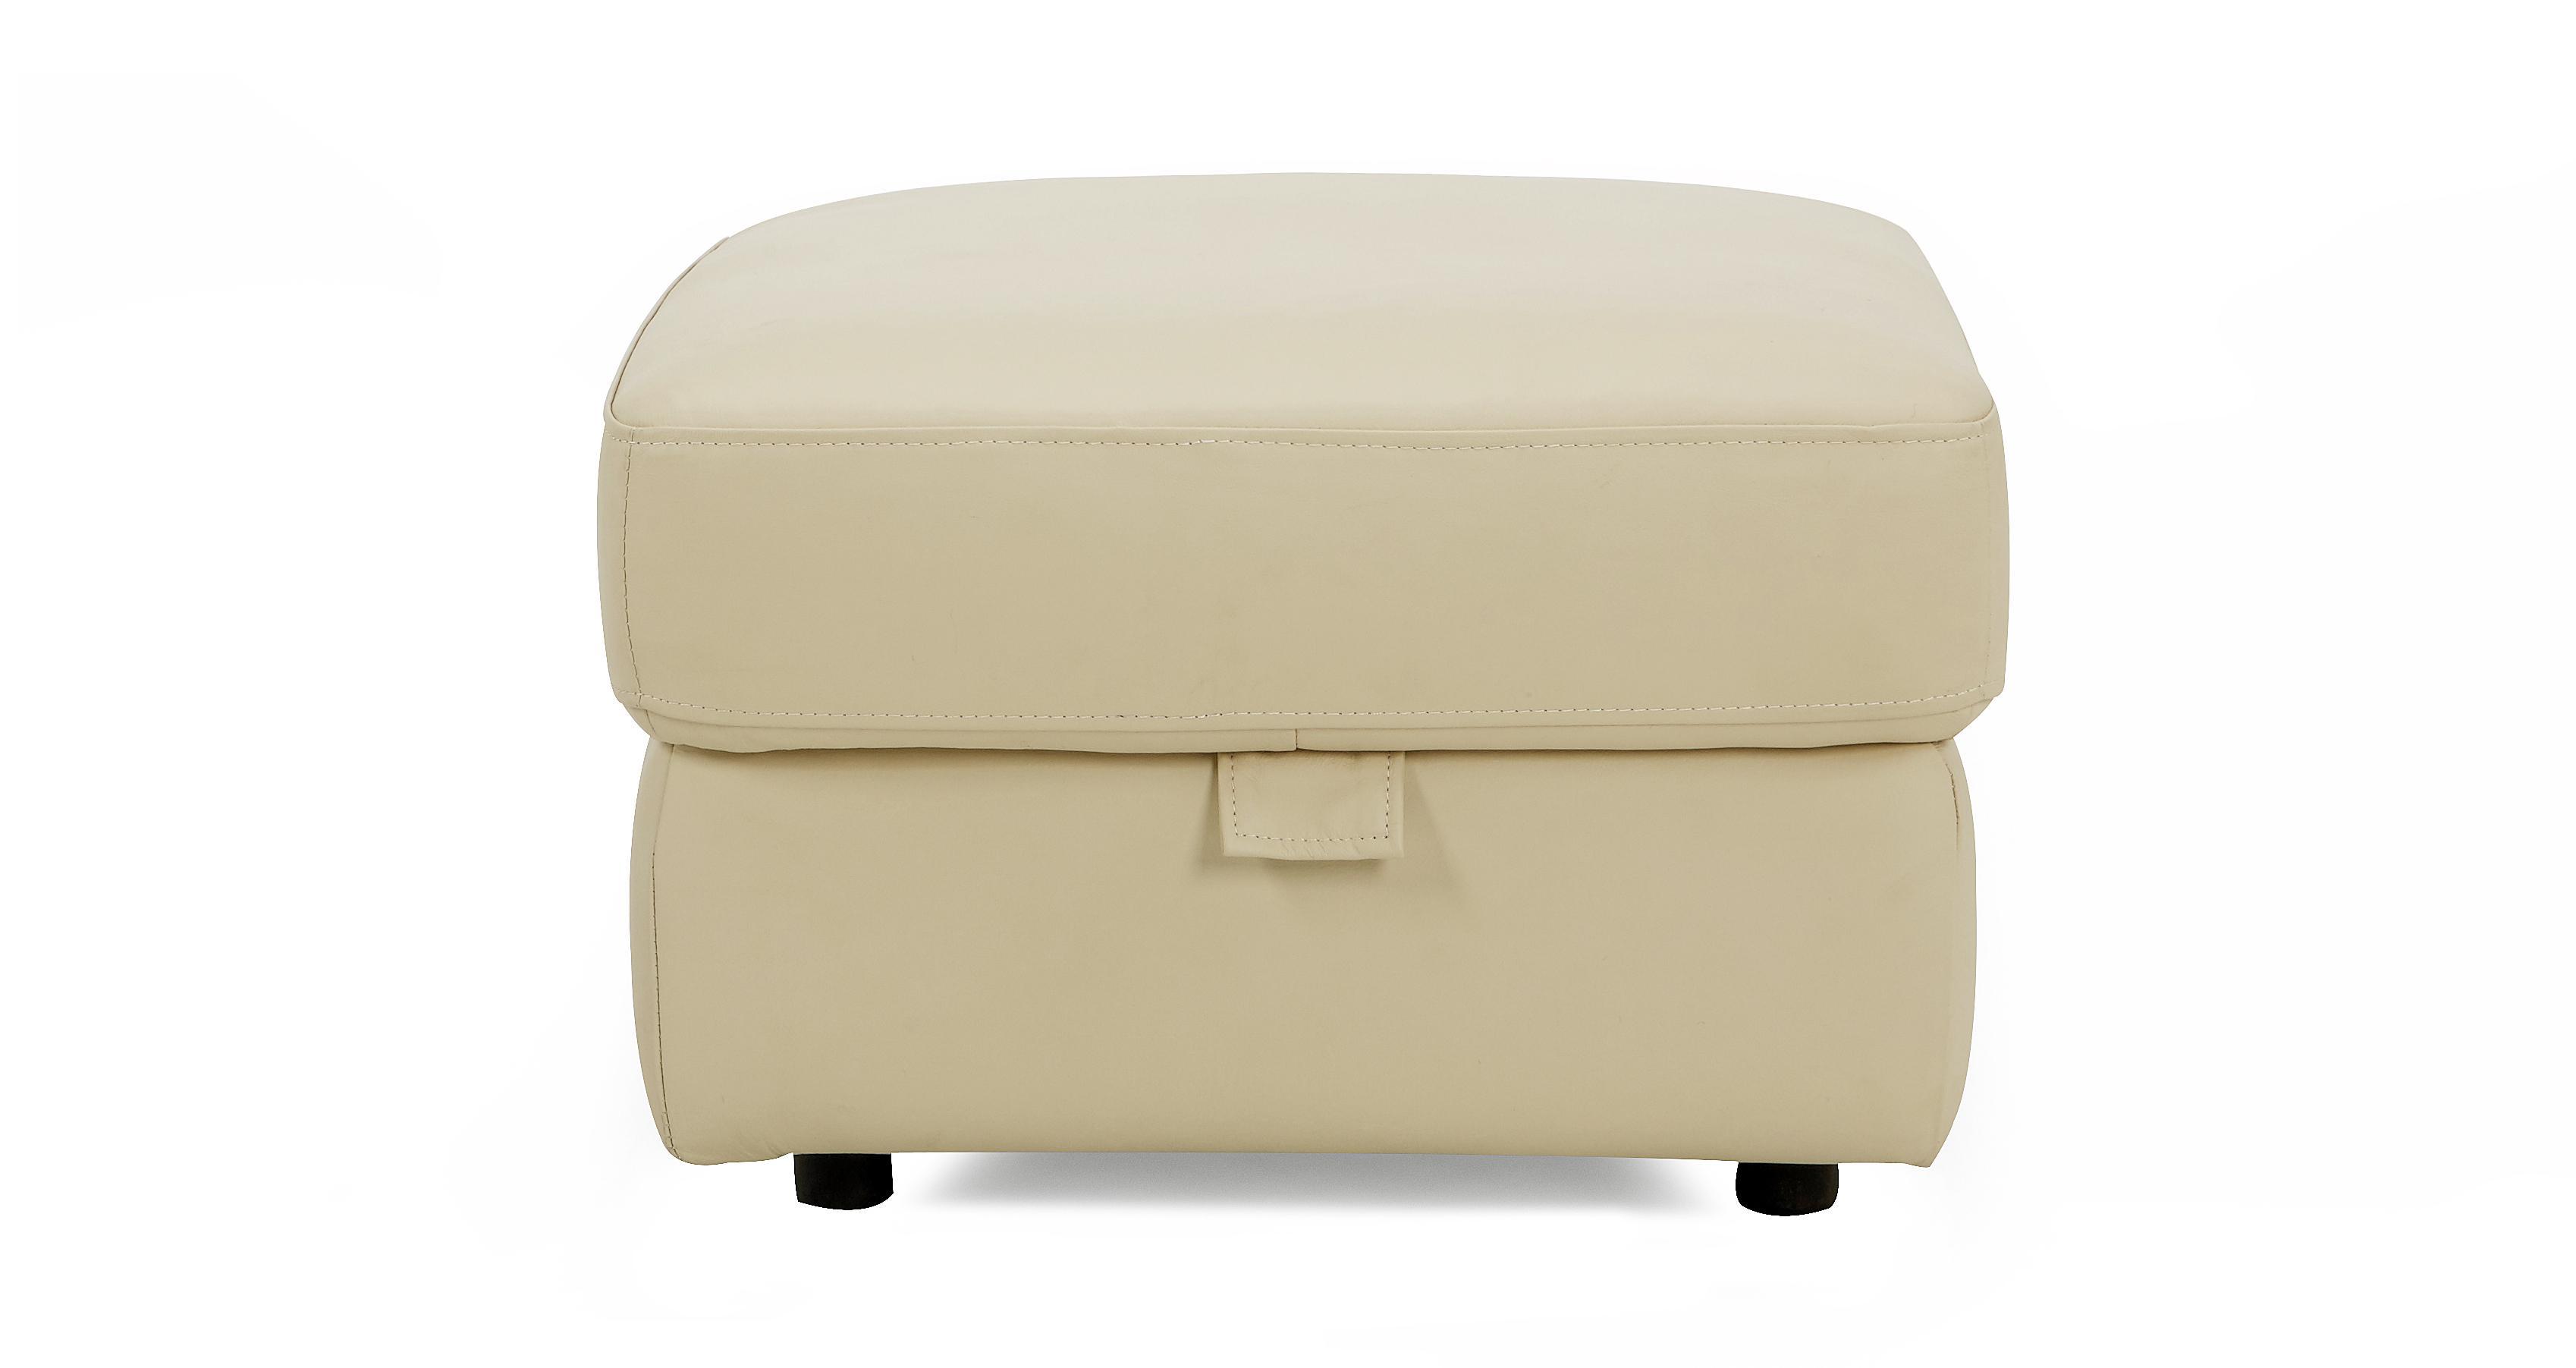 dfs navona sofa reviews best sleeper in the world storage footstool peru